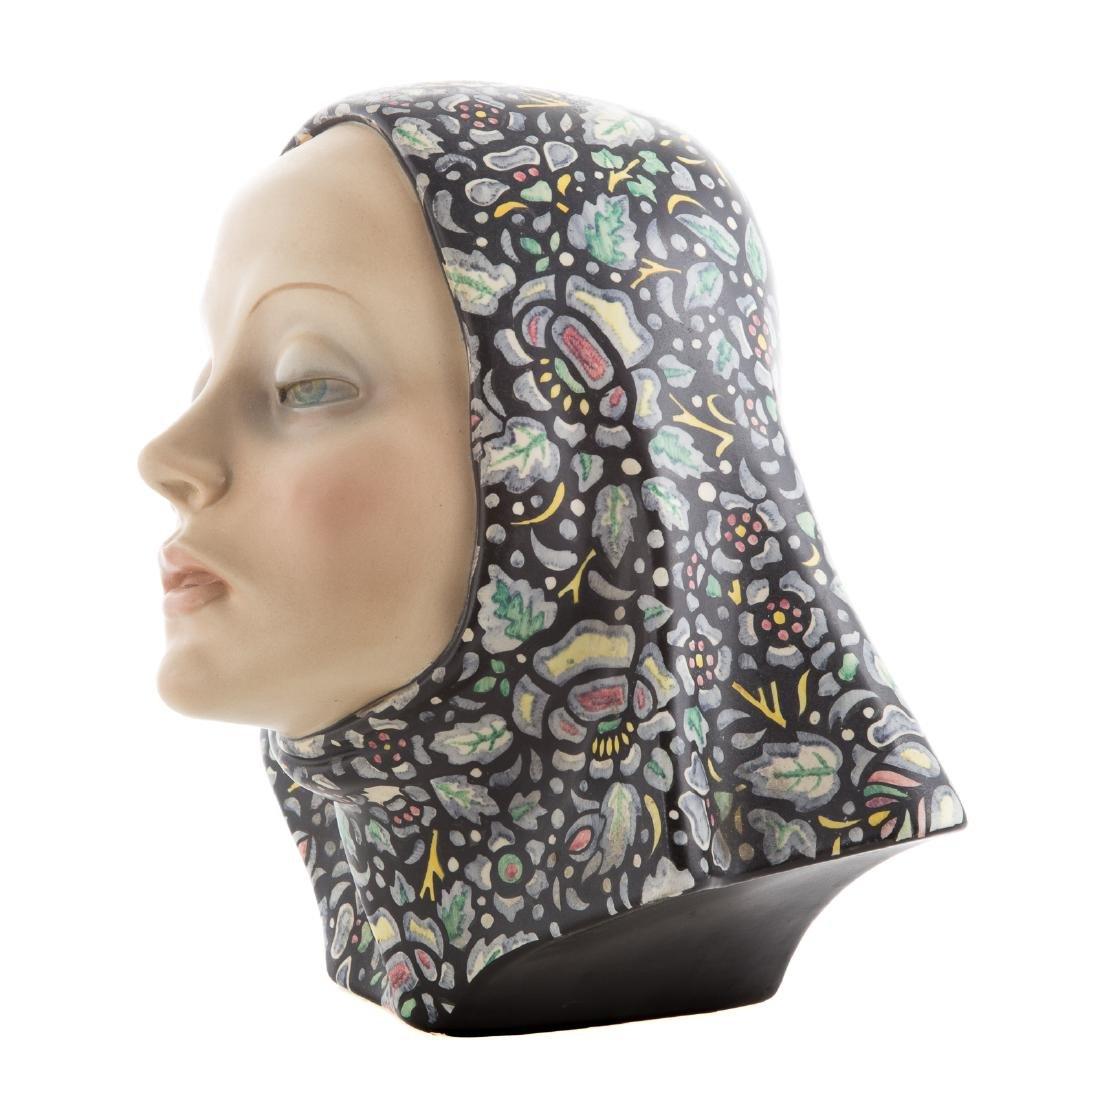 Lence glazed ceramic bust of woman - 3